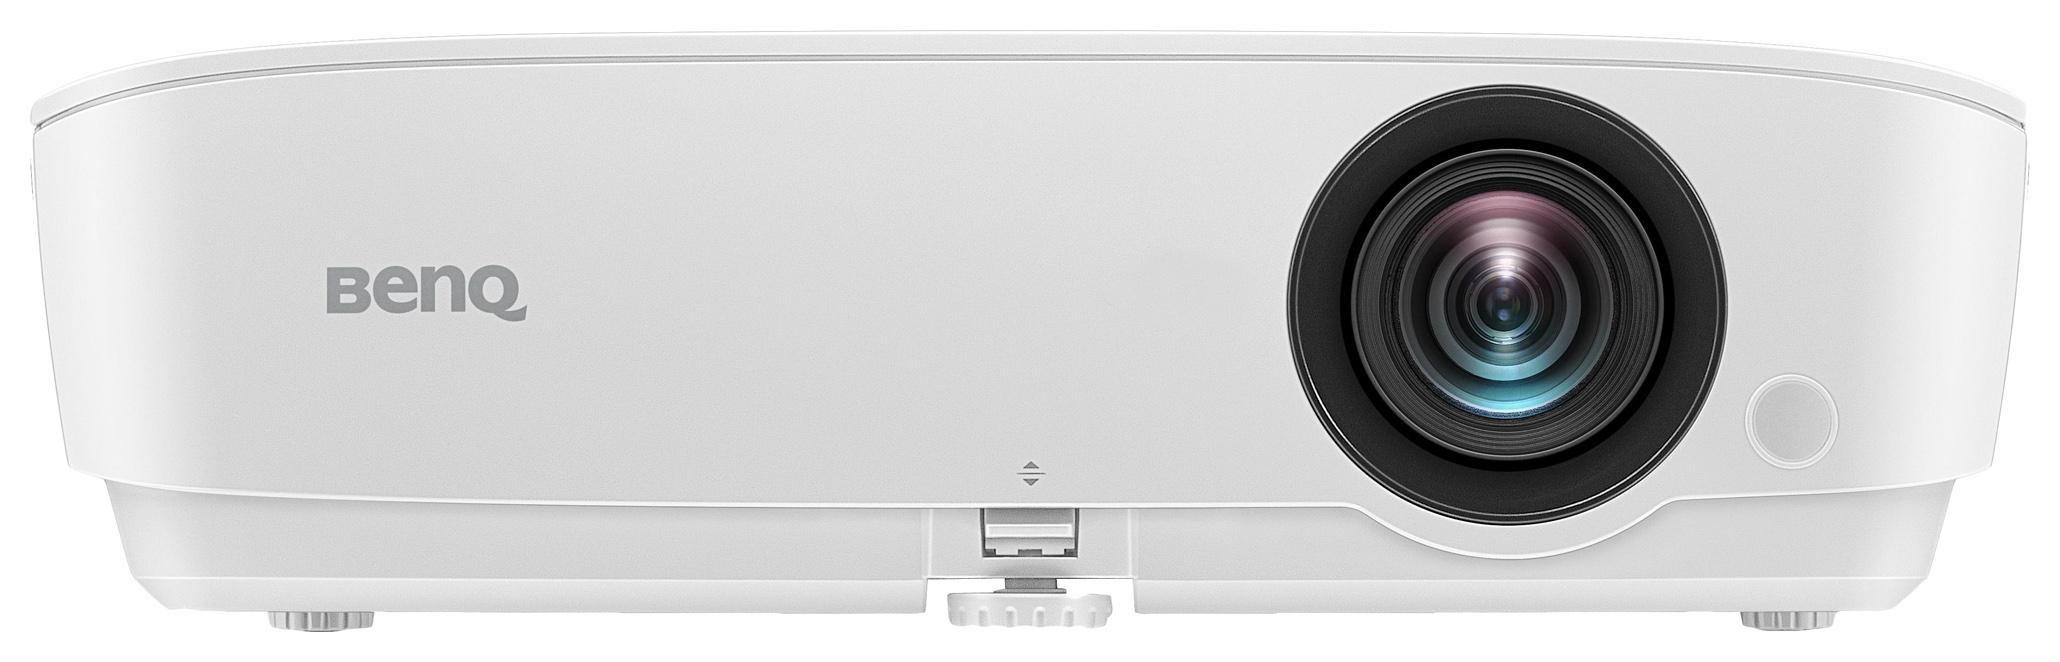 Видеопроектор BenQ MX535 9H.JJV77.33E